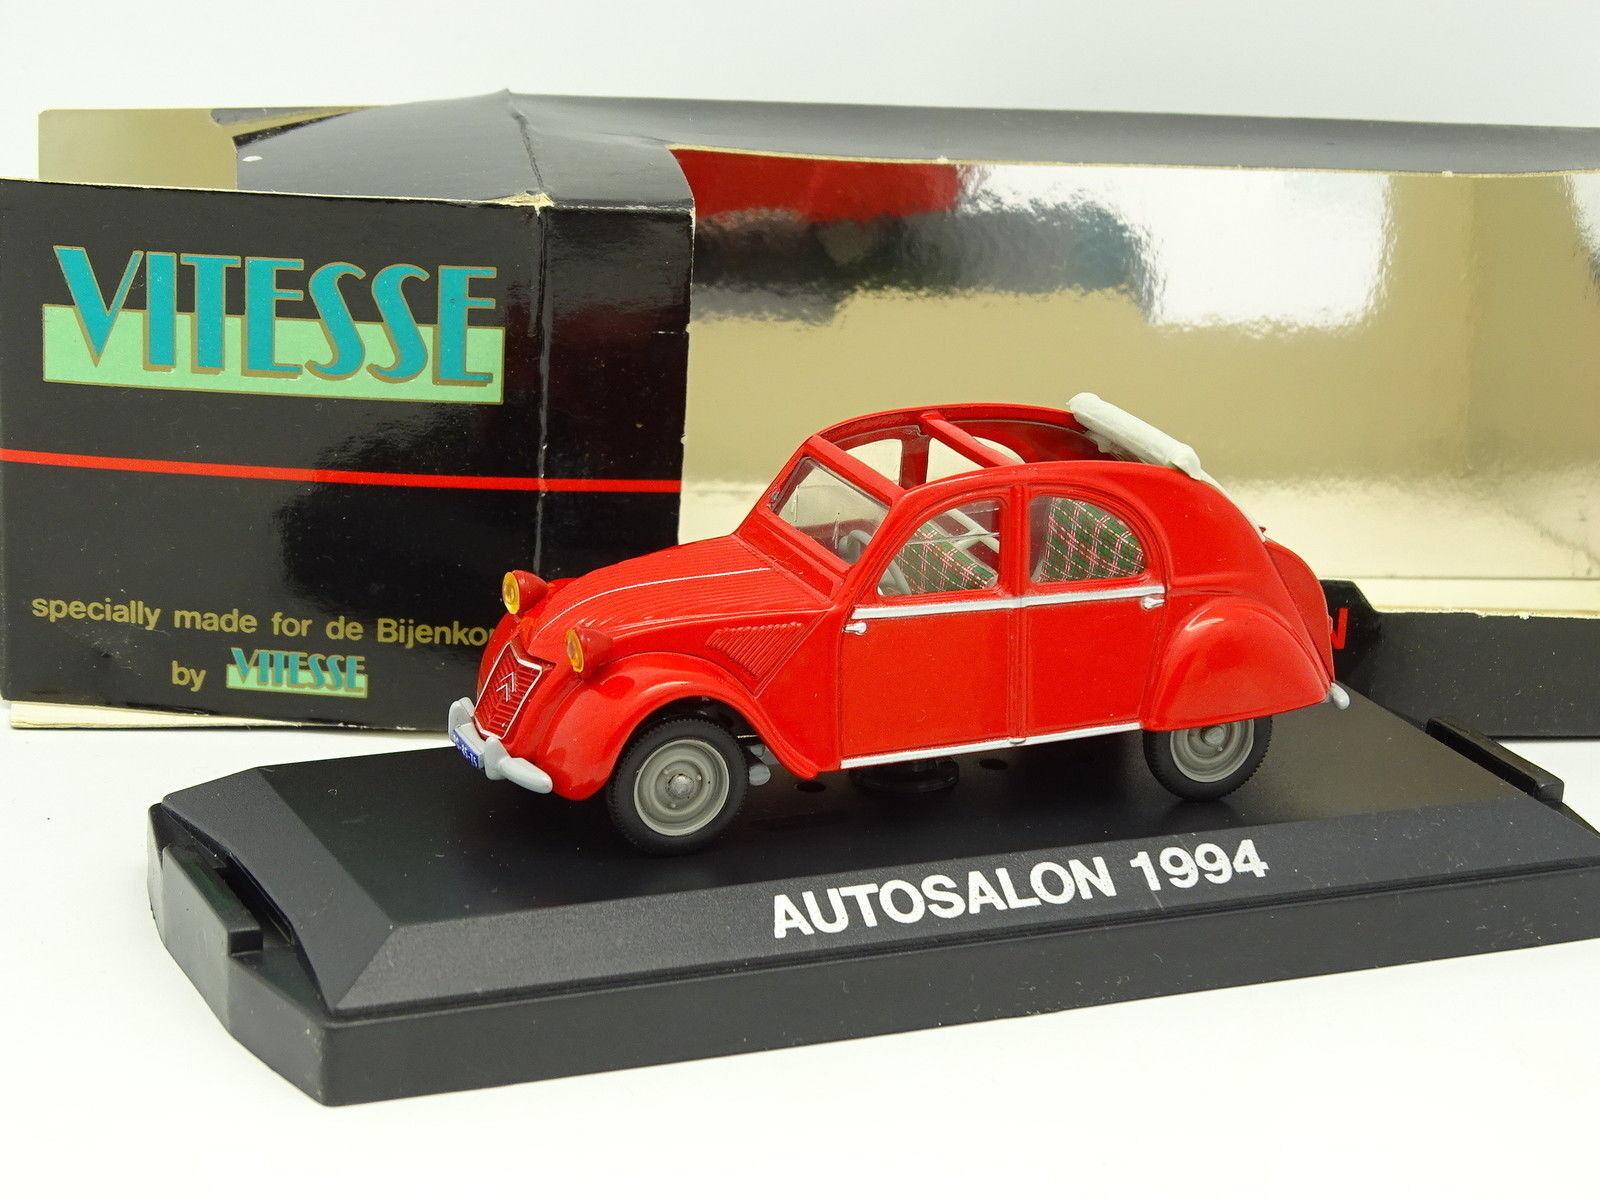 Vitesse 1 43 - Citroen 2CV red 1953 AutoSalon AutoSalon AutoSalon 1994 016e11